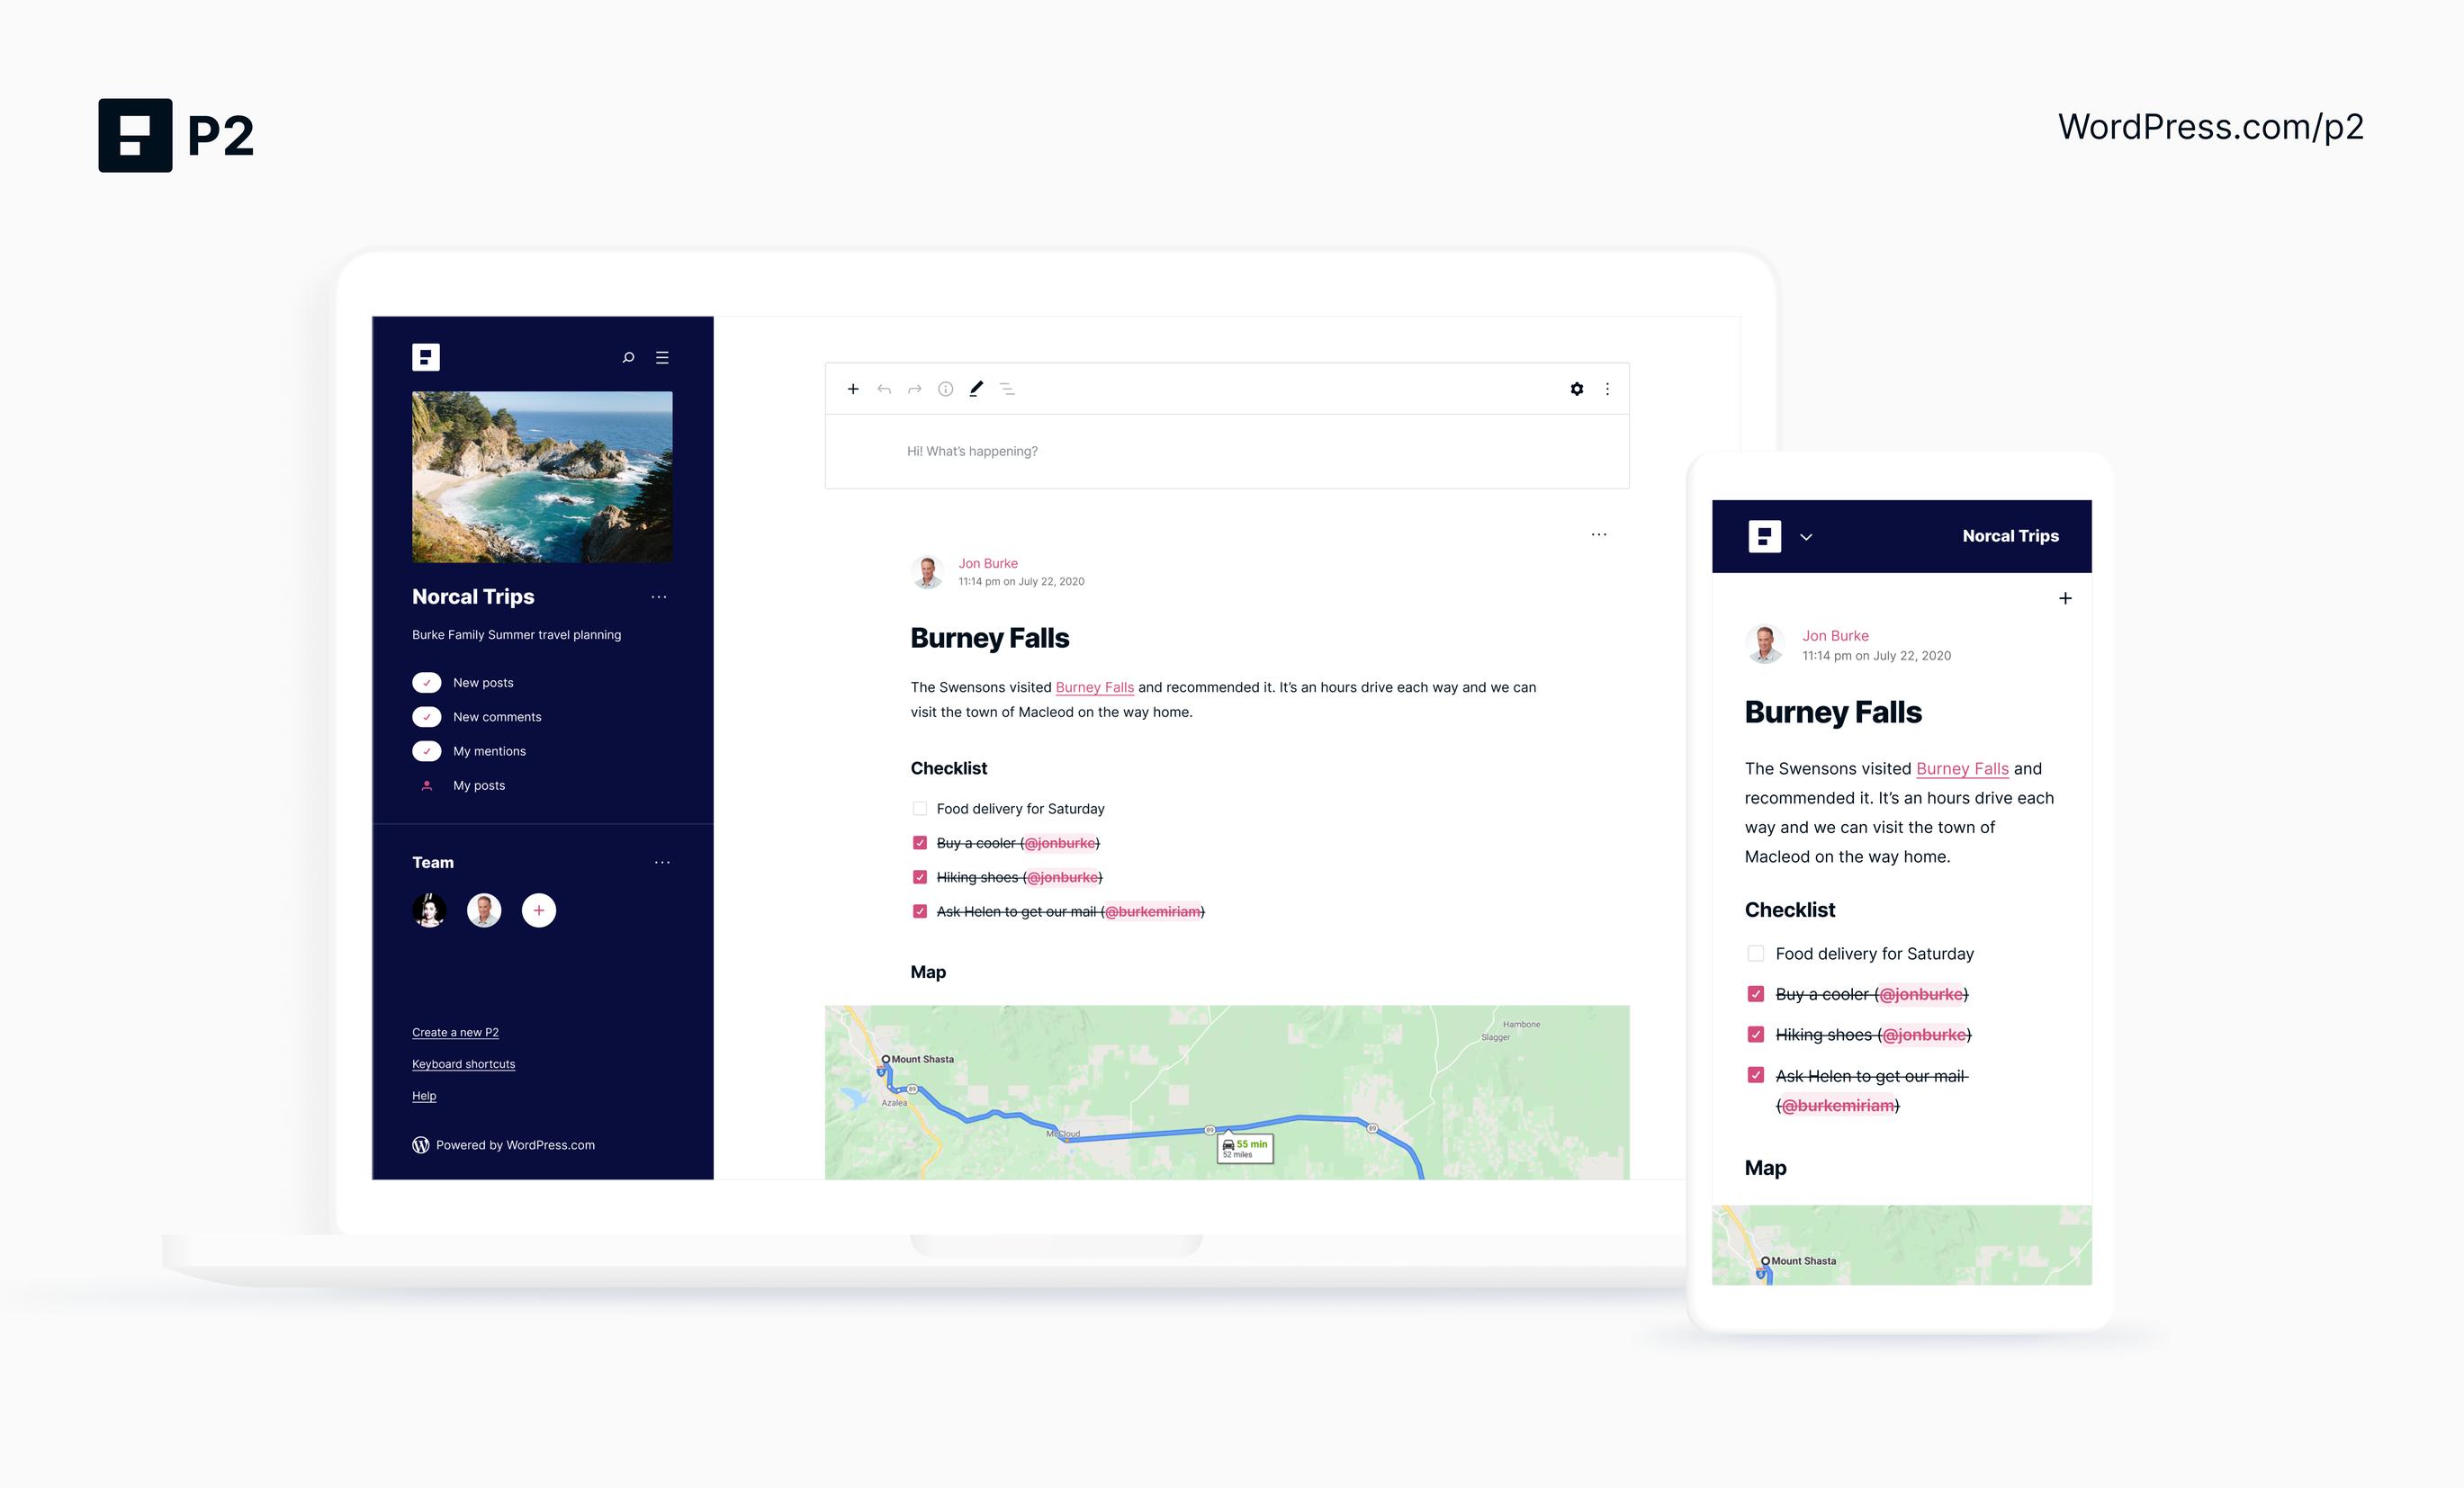 p2-screen-3 WordPress.com launches new P2 to take on internal communication tools – TechCrunch